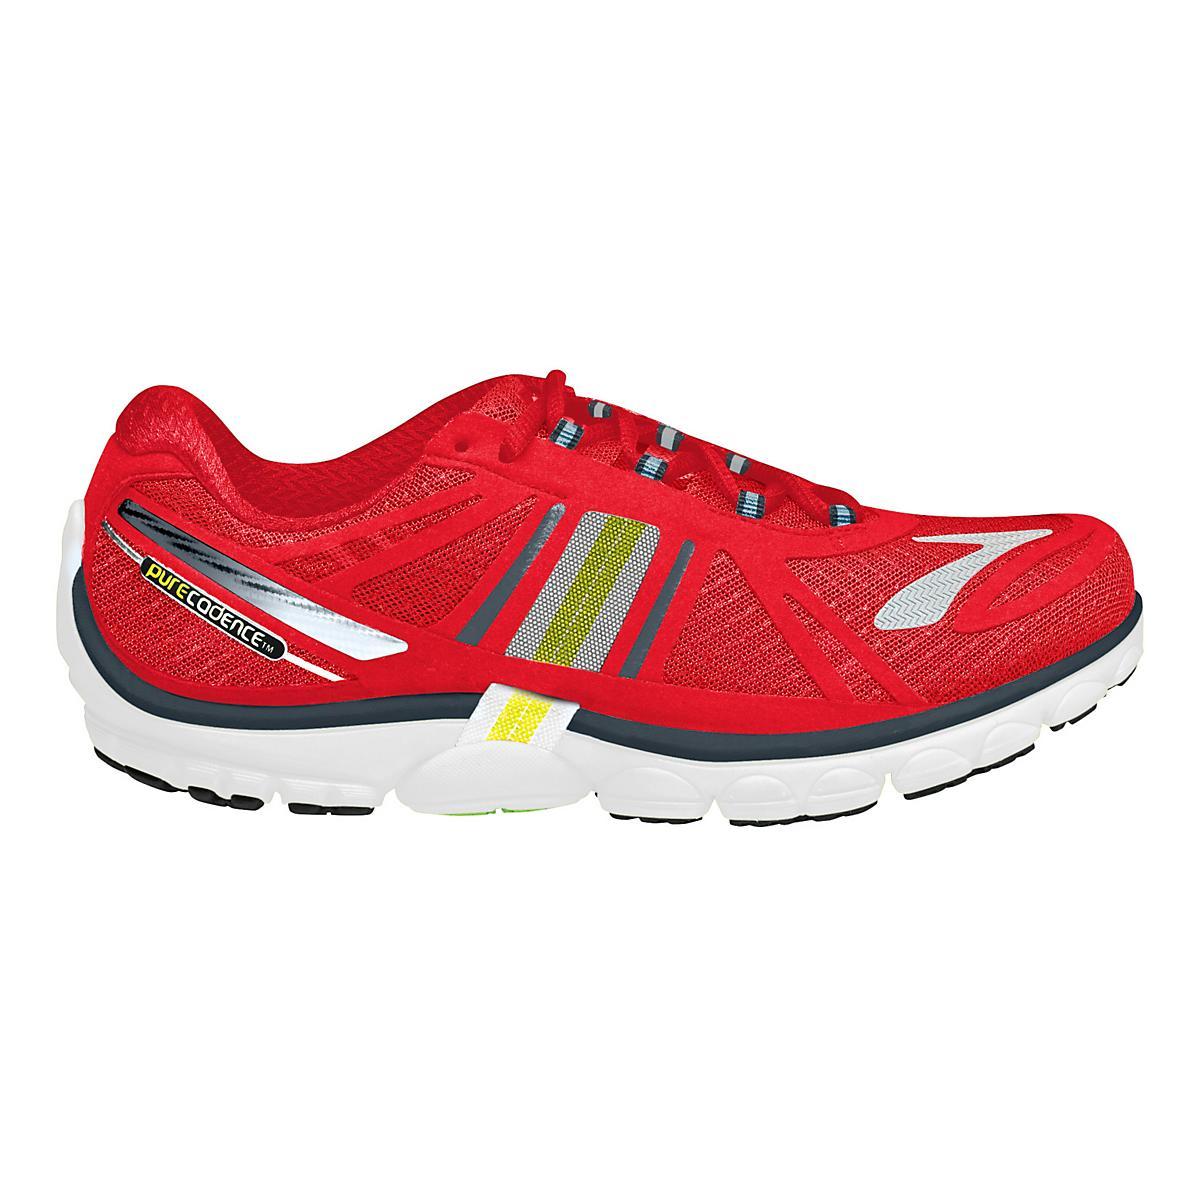 e55250806e8 Mens Brooks PureCadence 2 Running Shoe at Road Runner Sports